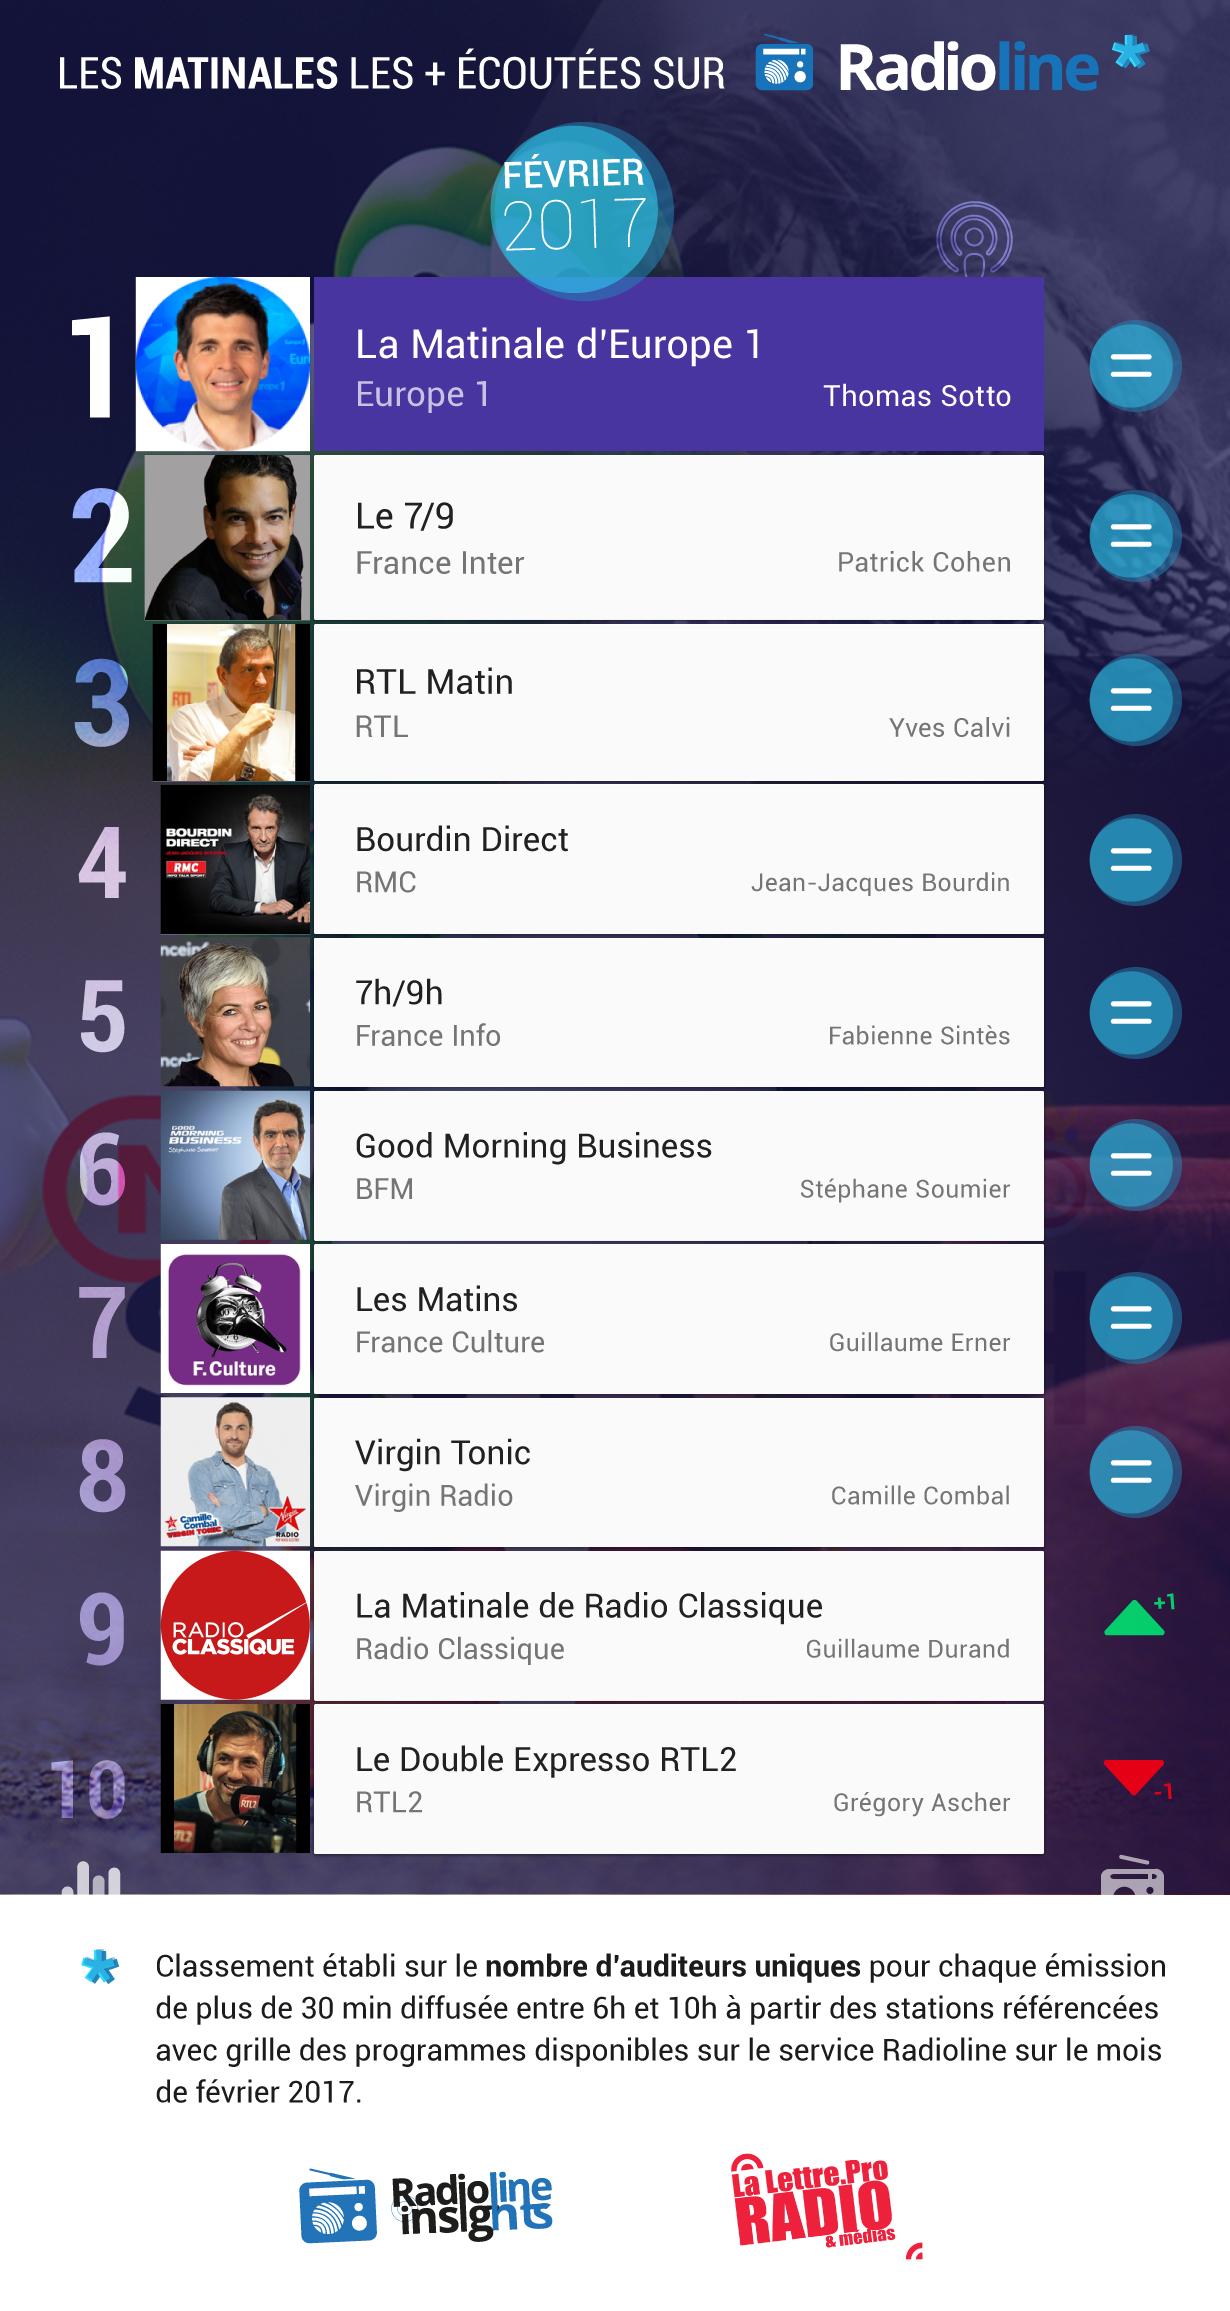 #RadiolineInsights : le classement des matinales